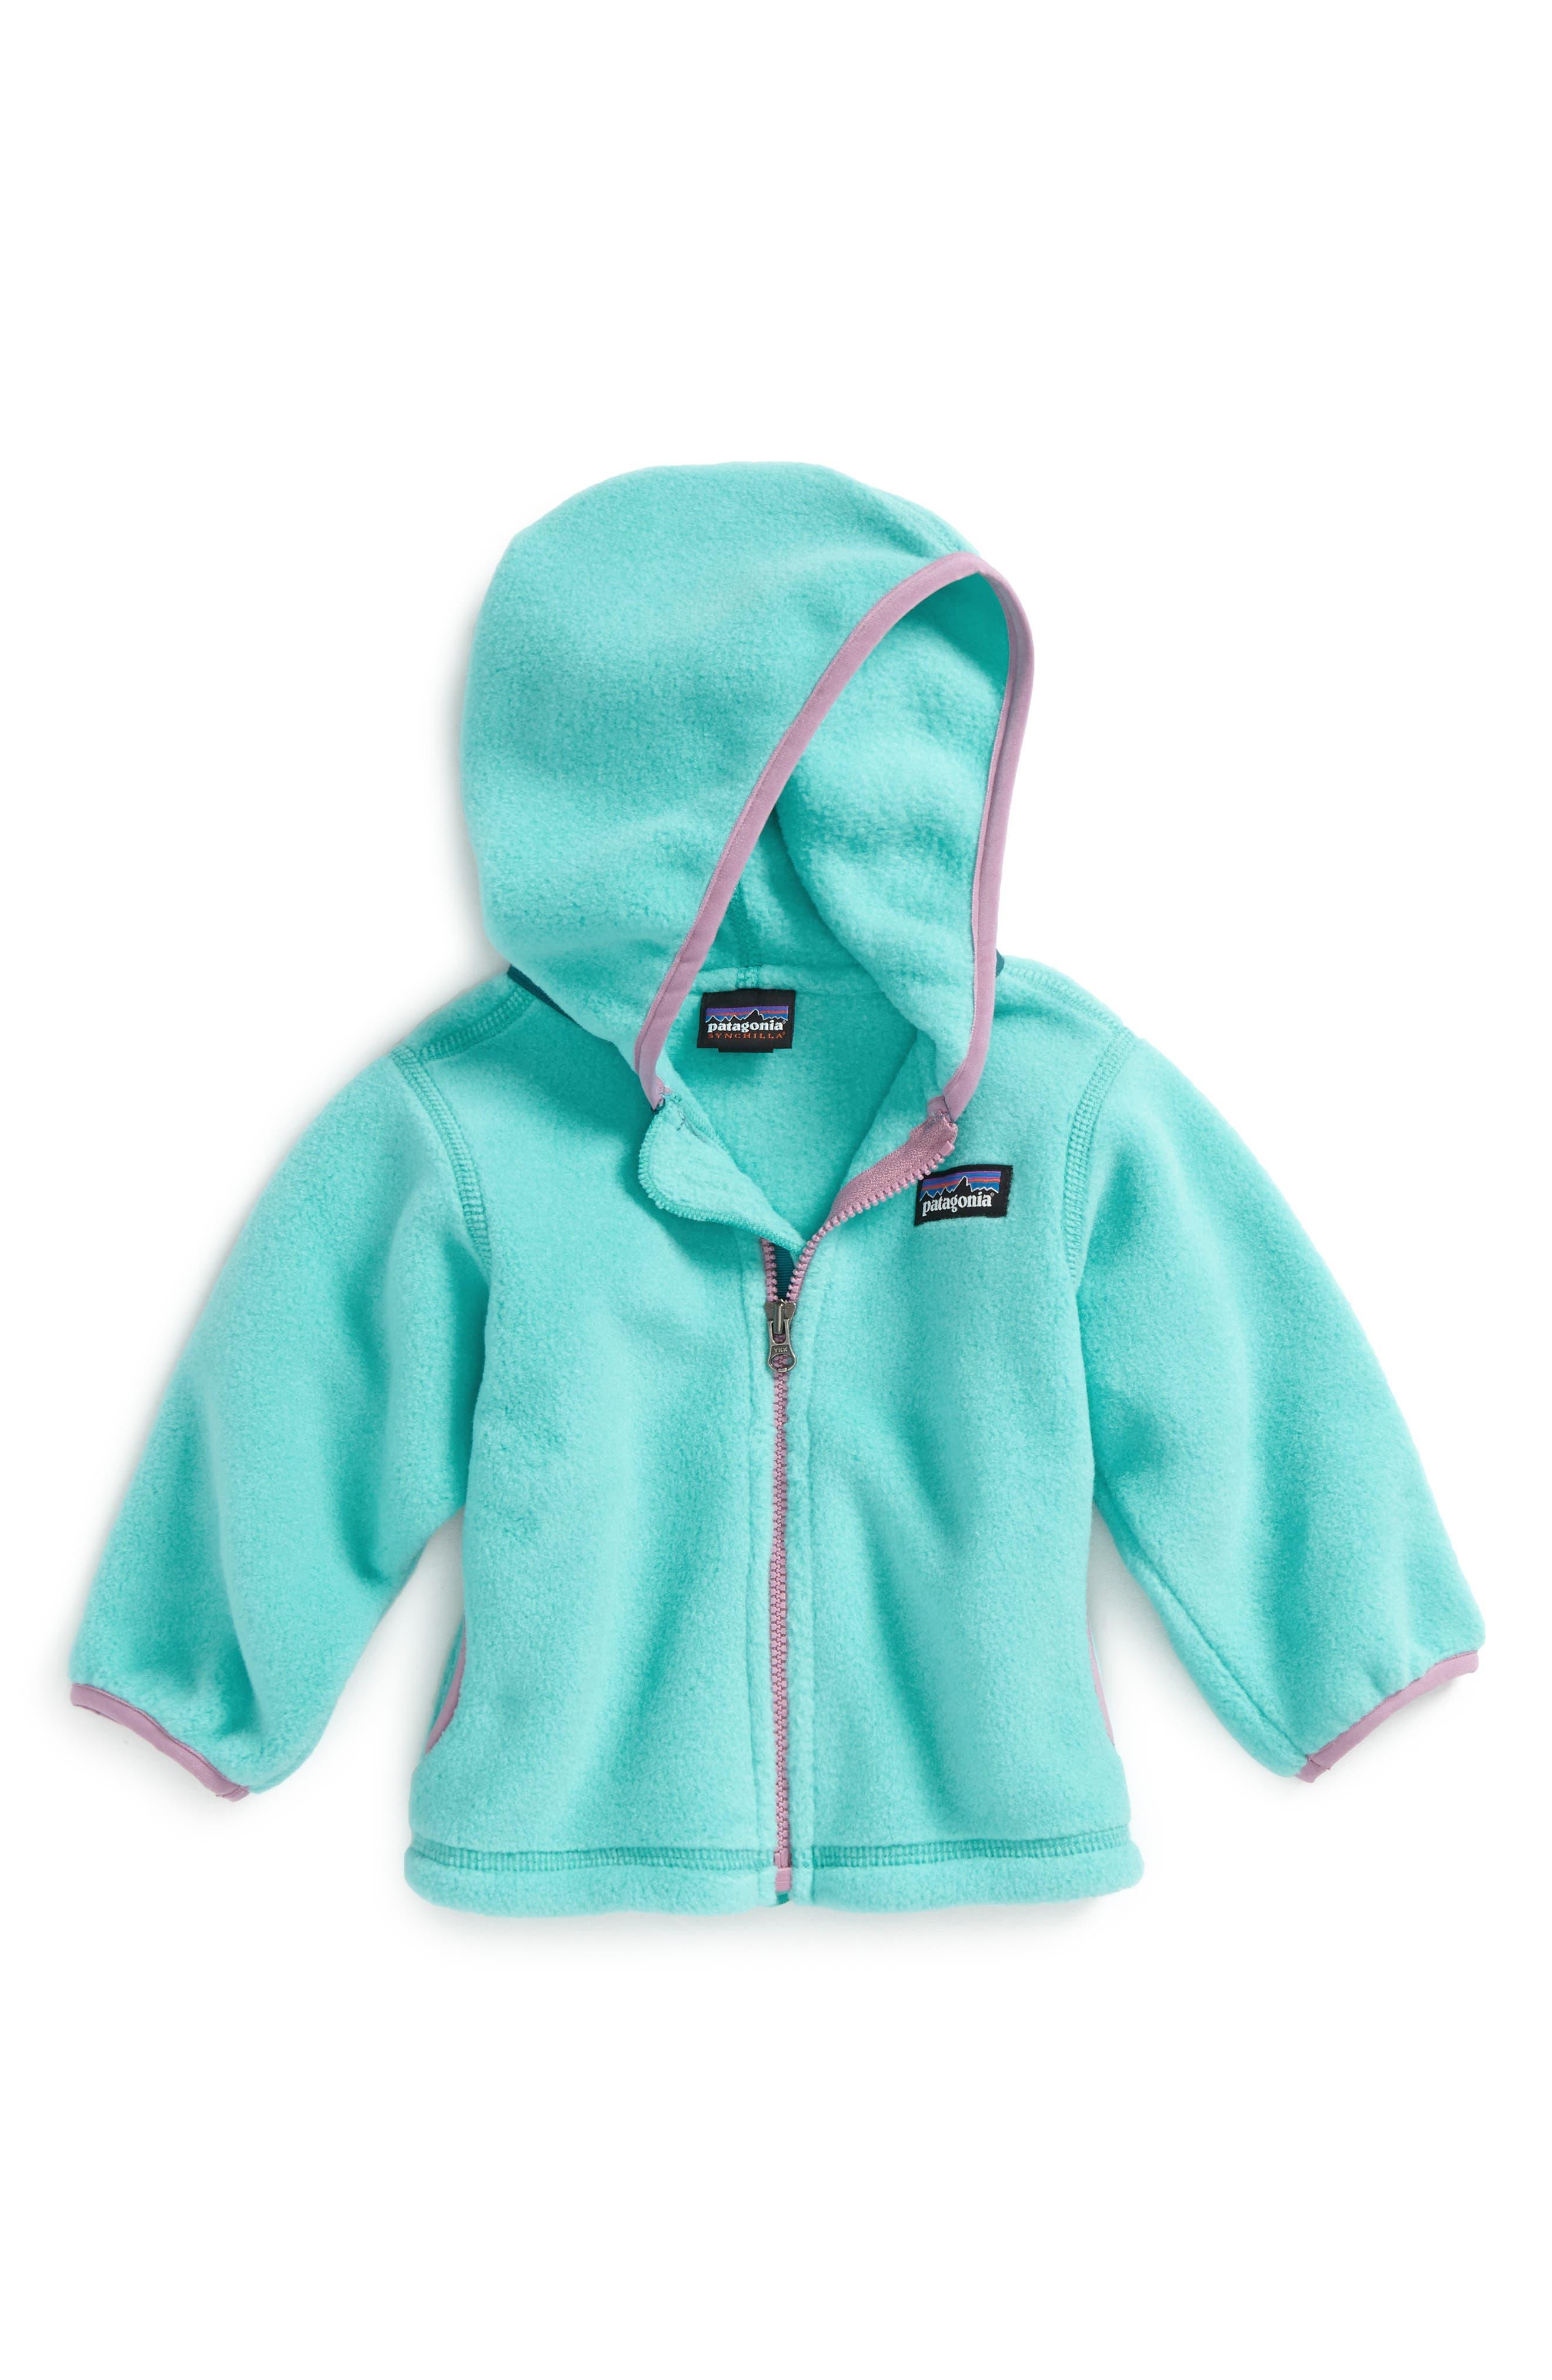 Alternate Image 1 Selected - Patagonia Synchilla® Fleece Cardigan (Baby Girls)